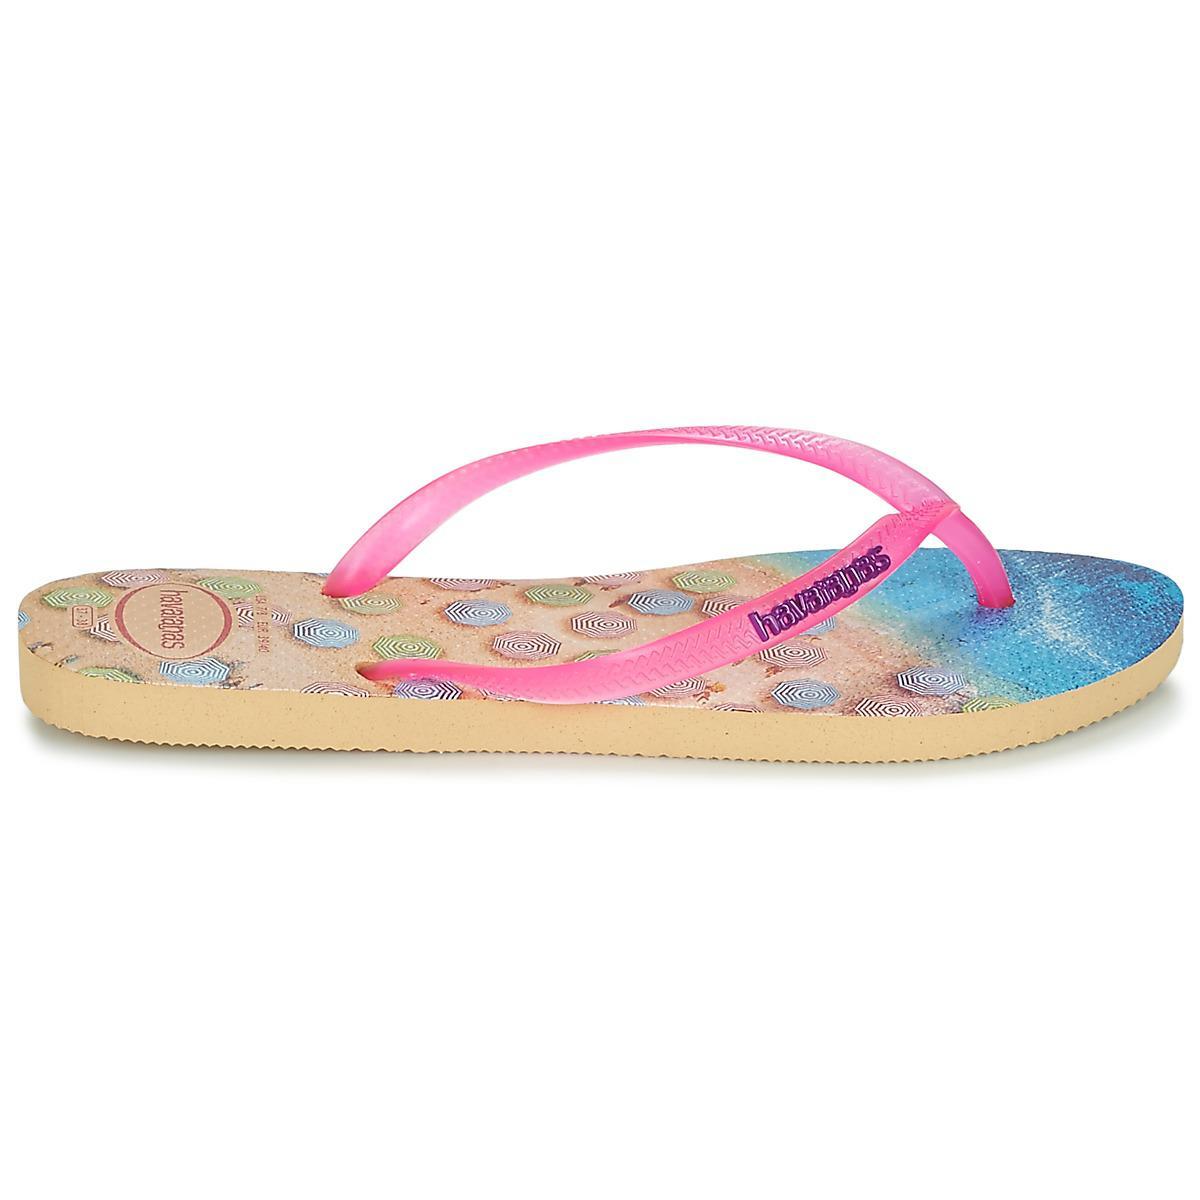 61285116090b Havaianas - Pink Slim Paisage Women s Flip Flops   Sandals (shoes) In  Multicolour -. View fullscreen